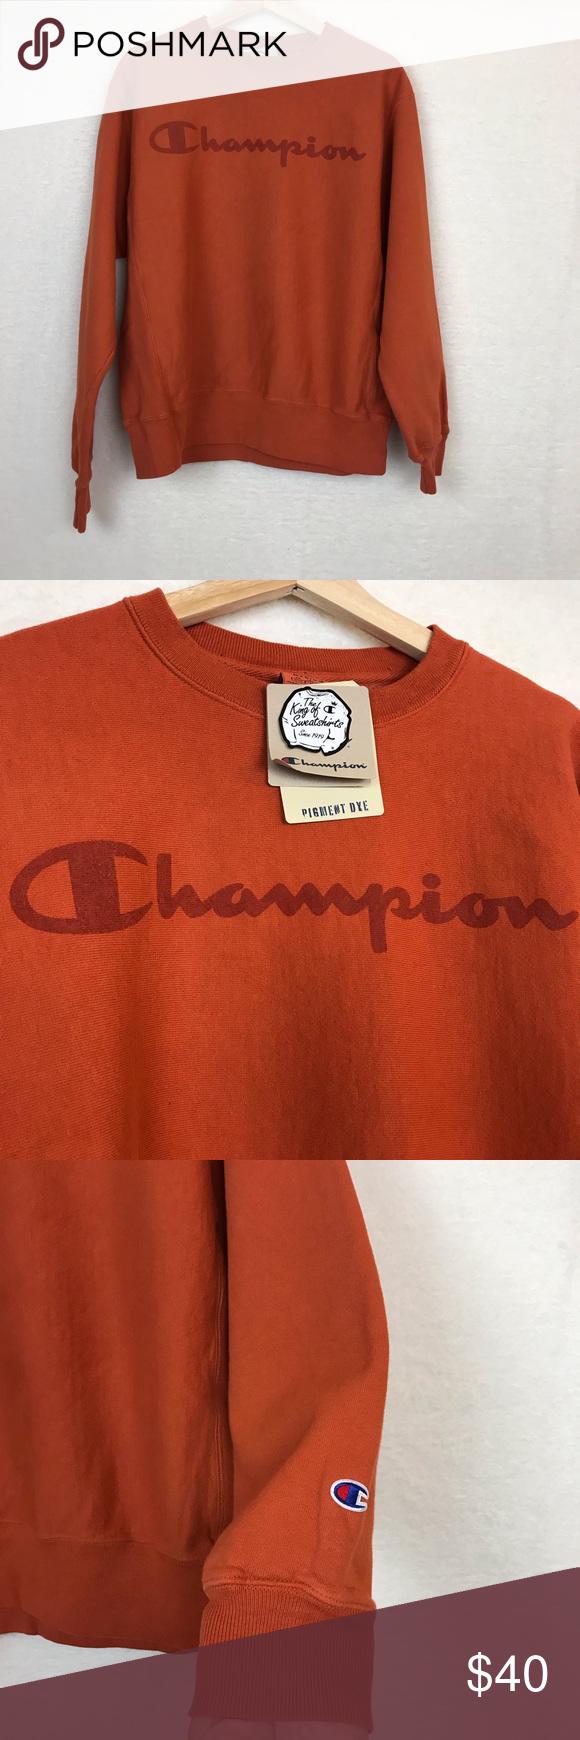 Champion Men S Crewneck Vintage Logo Crewneck Vintage Vintage Sweatshirt Vintage Logo [ 1740 x 580 Pixel ]